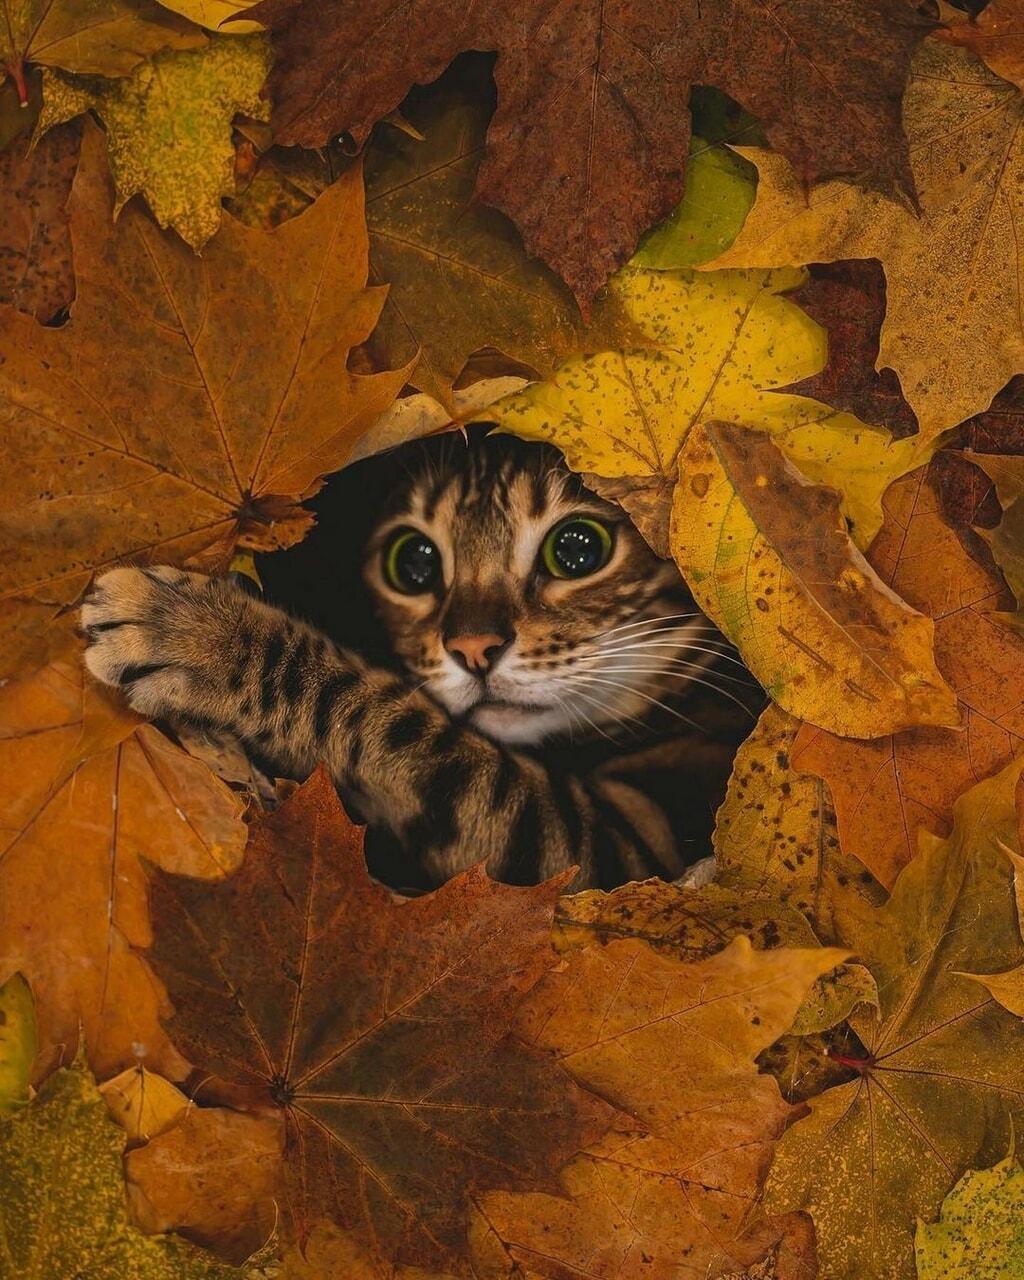 animals and autumn image